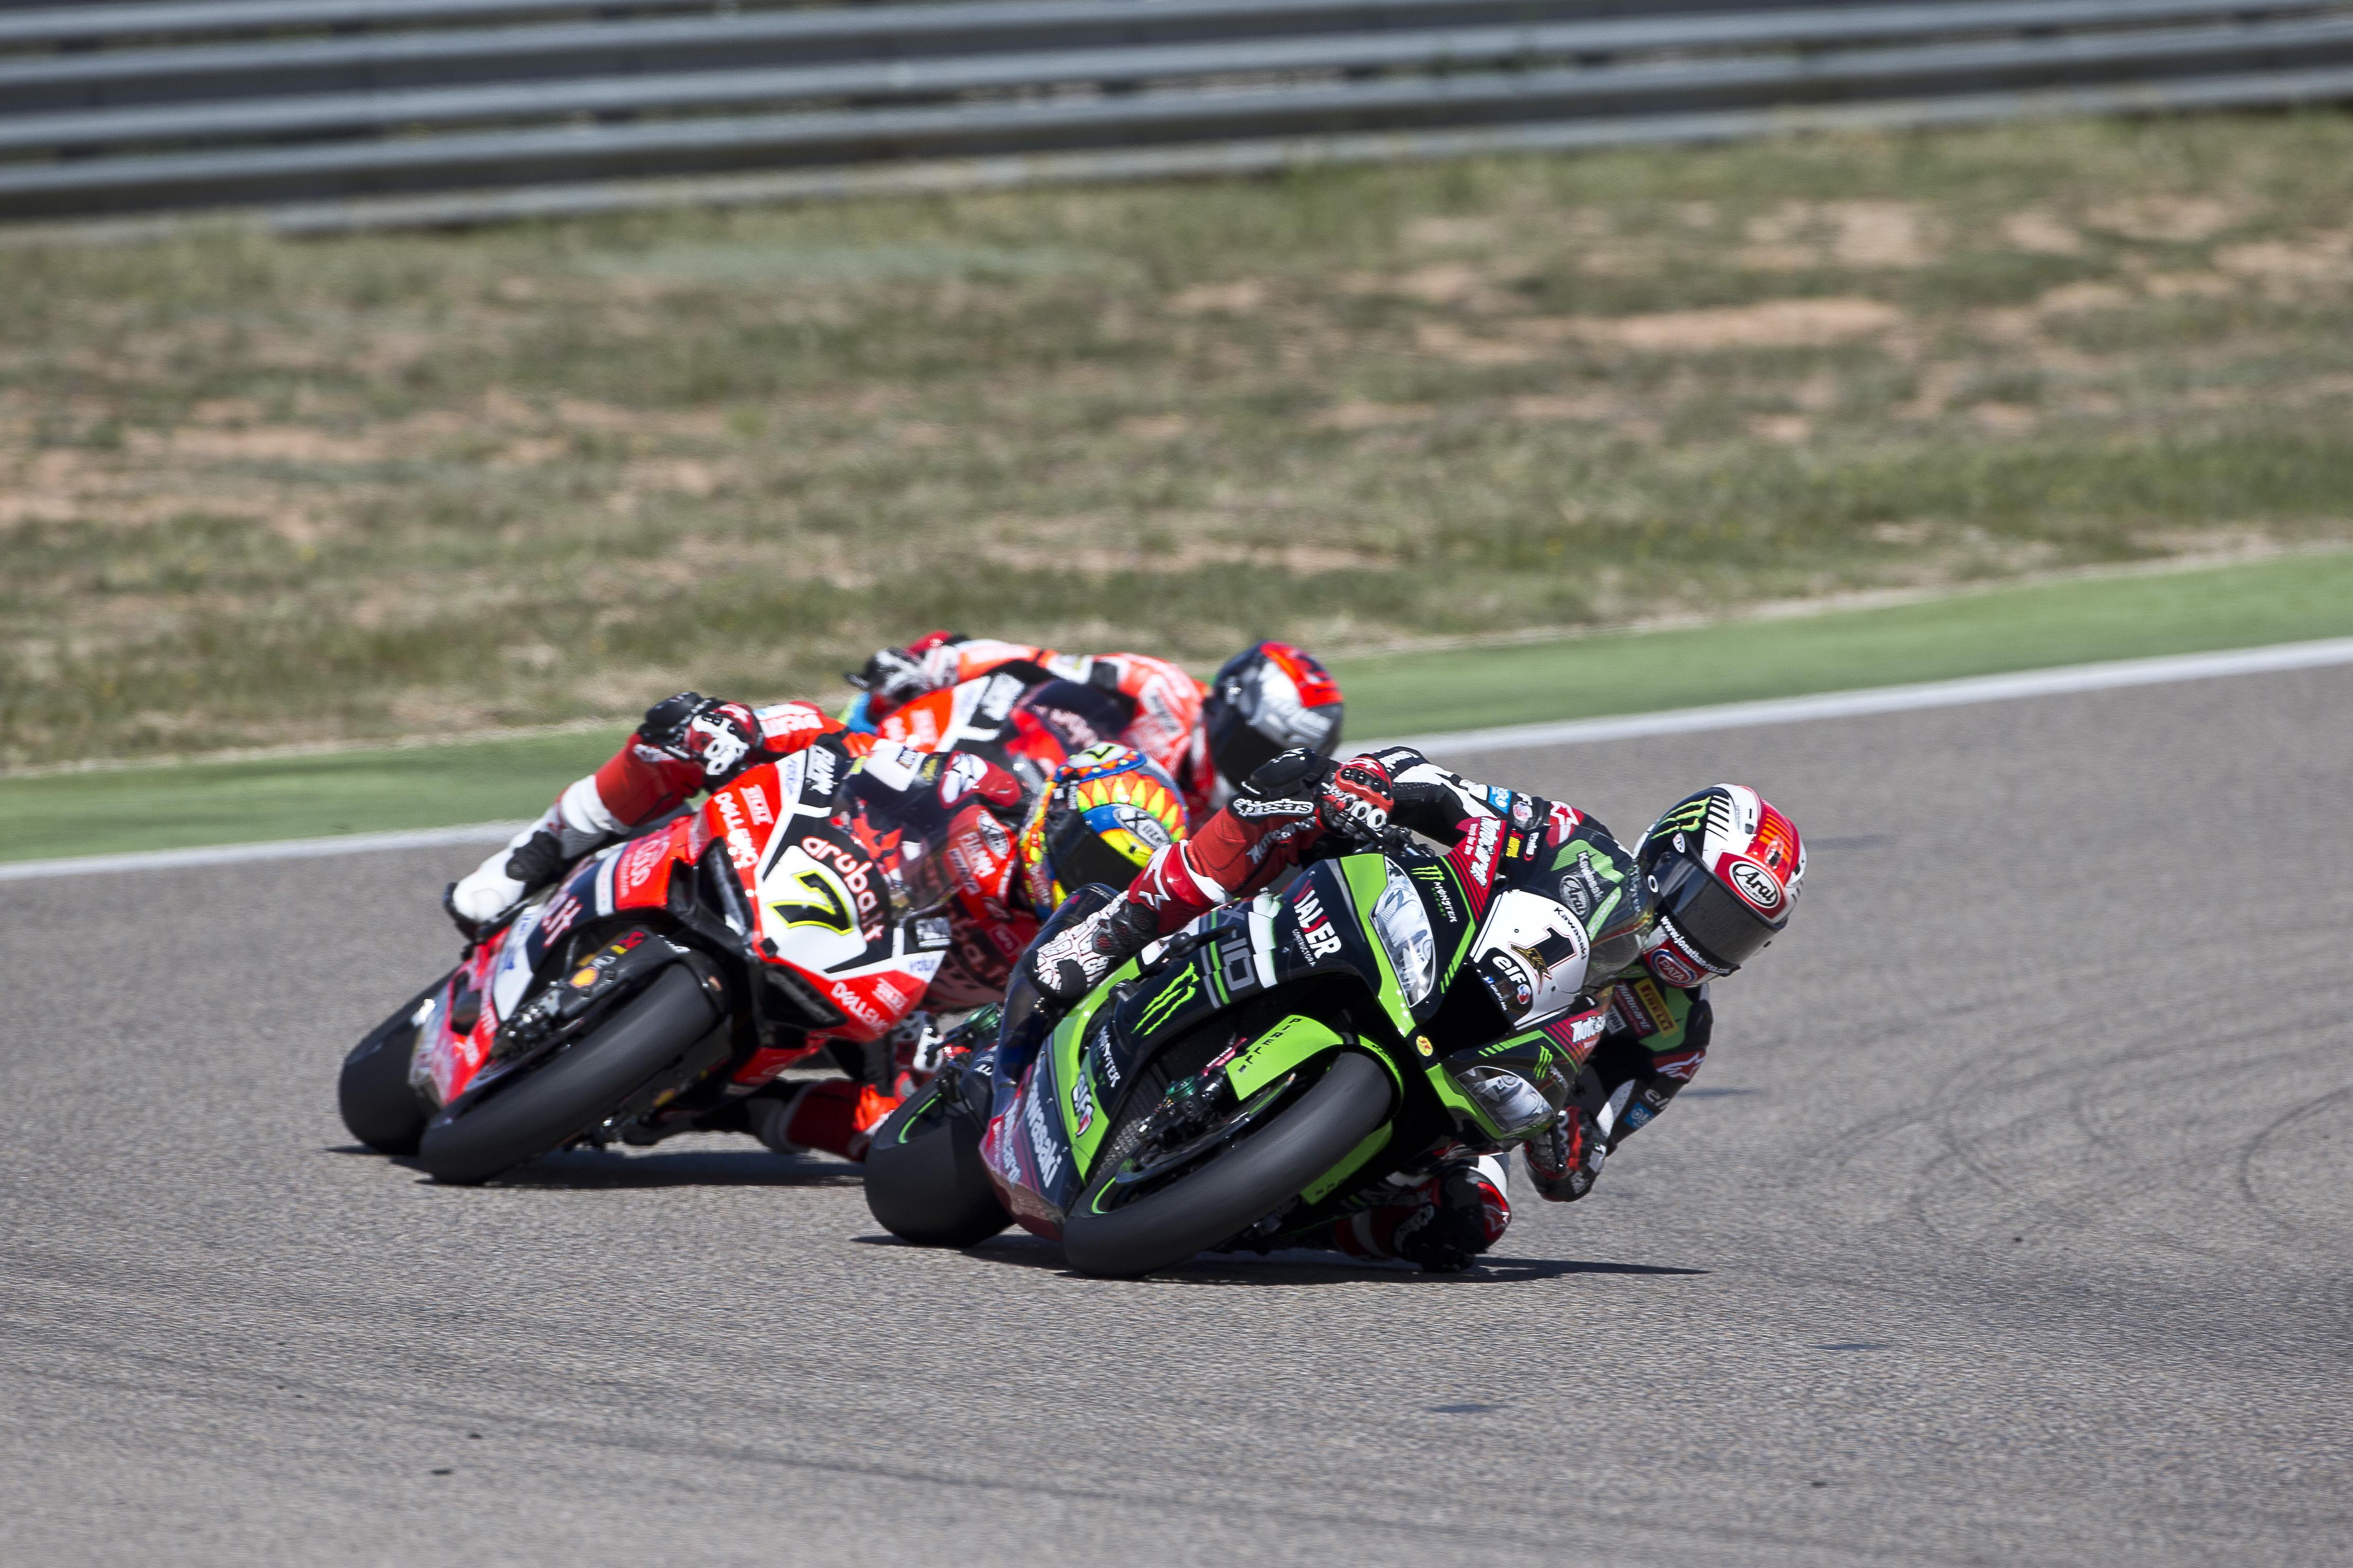 hi_02_Motorland Aragon_WorldSBK_2017_Race 2_ReaC87Q7005